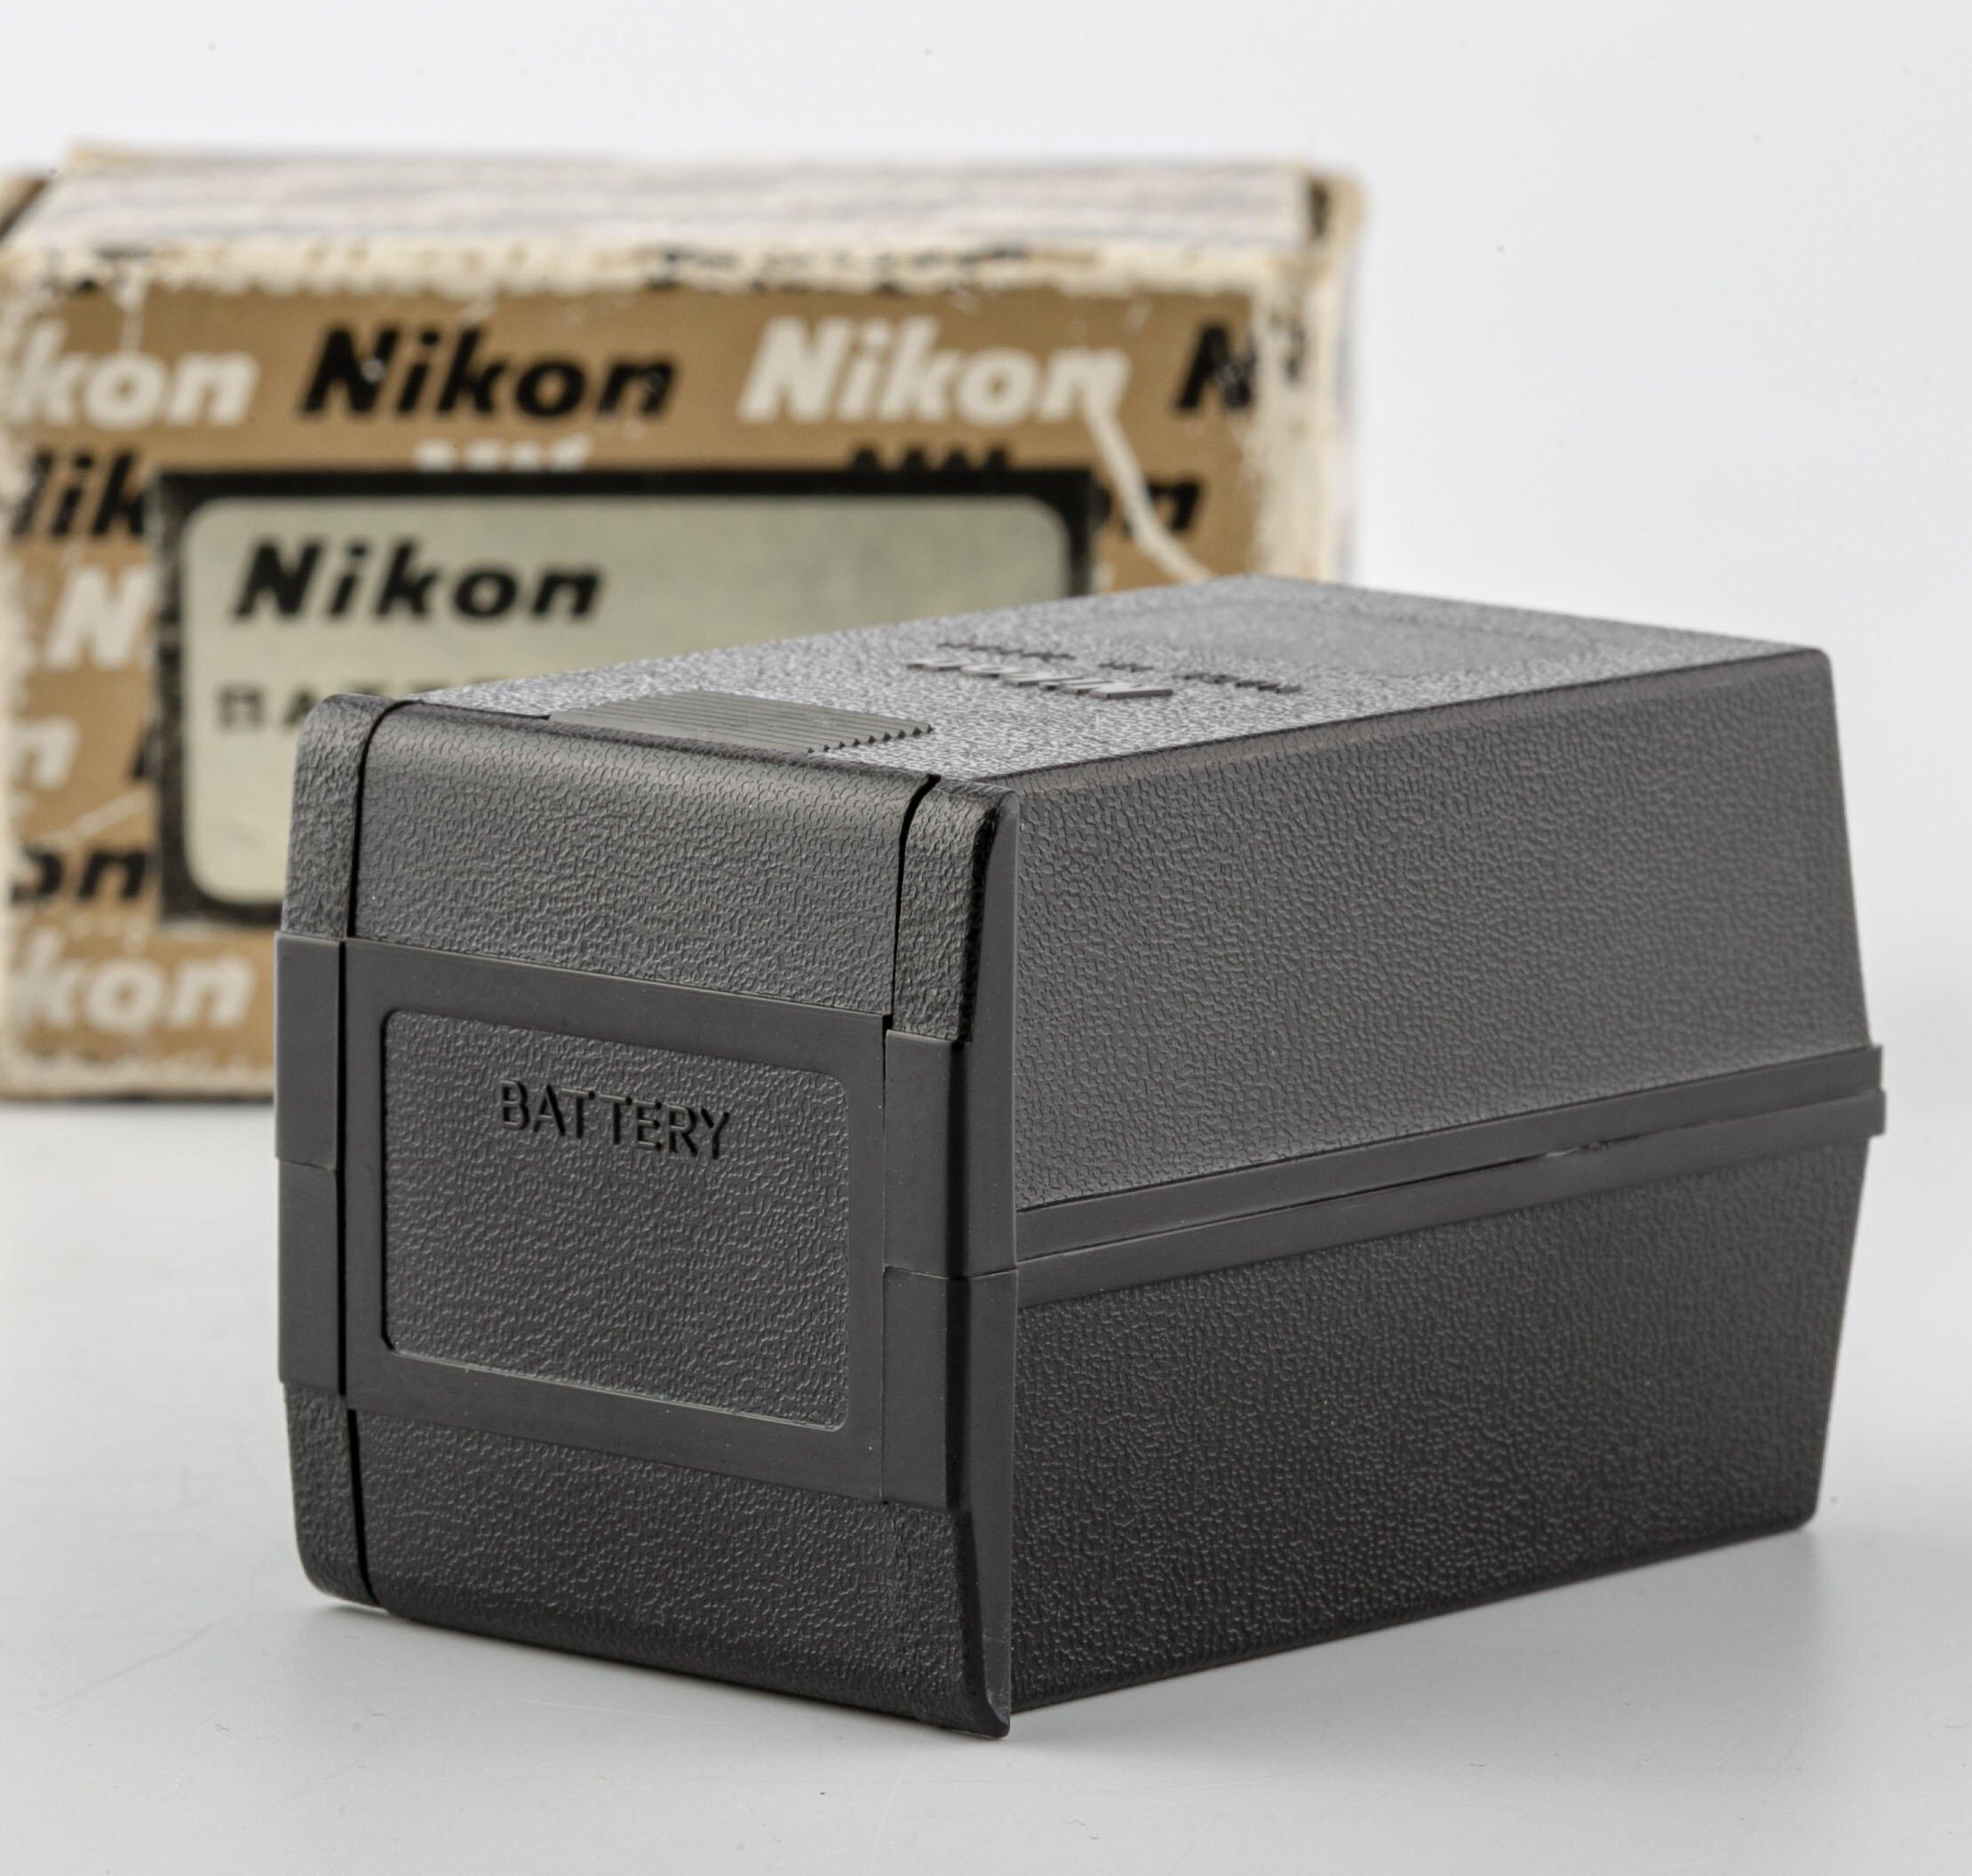 Nikon F Batteryholder for MB2